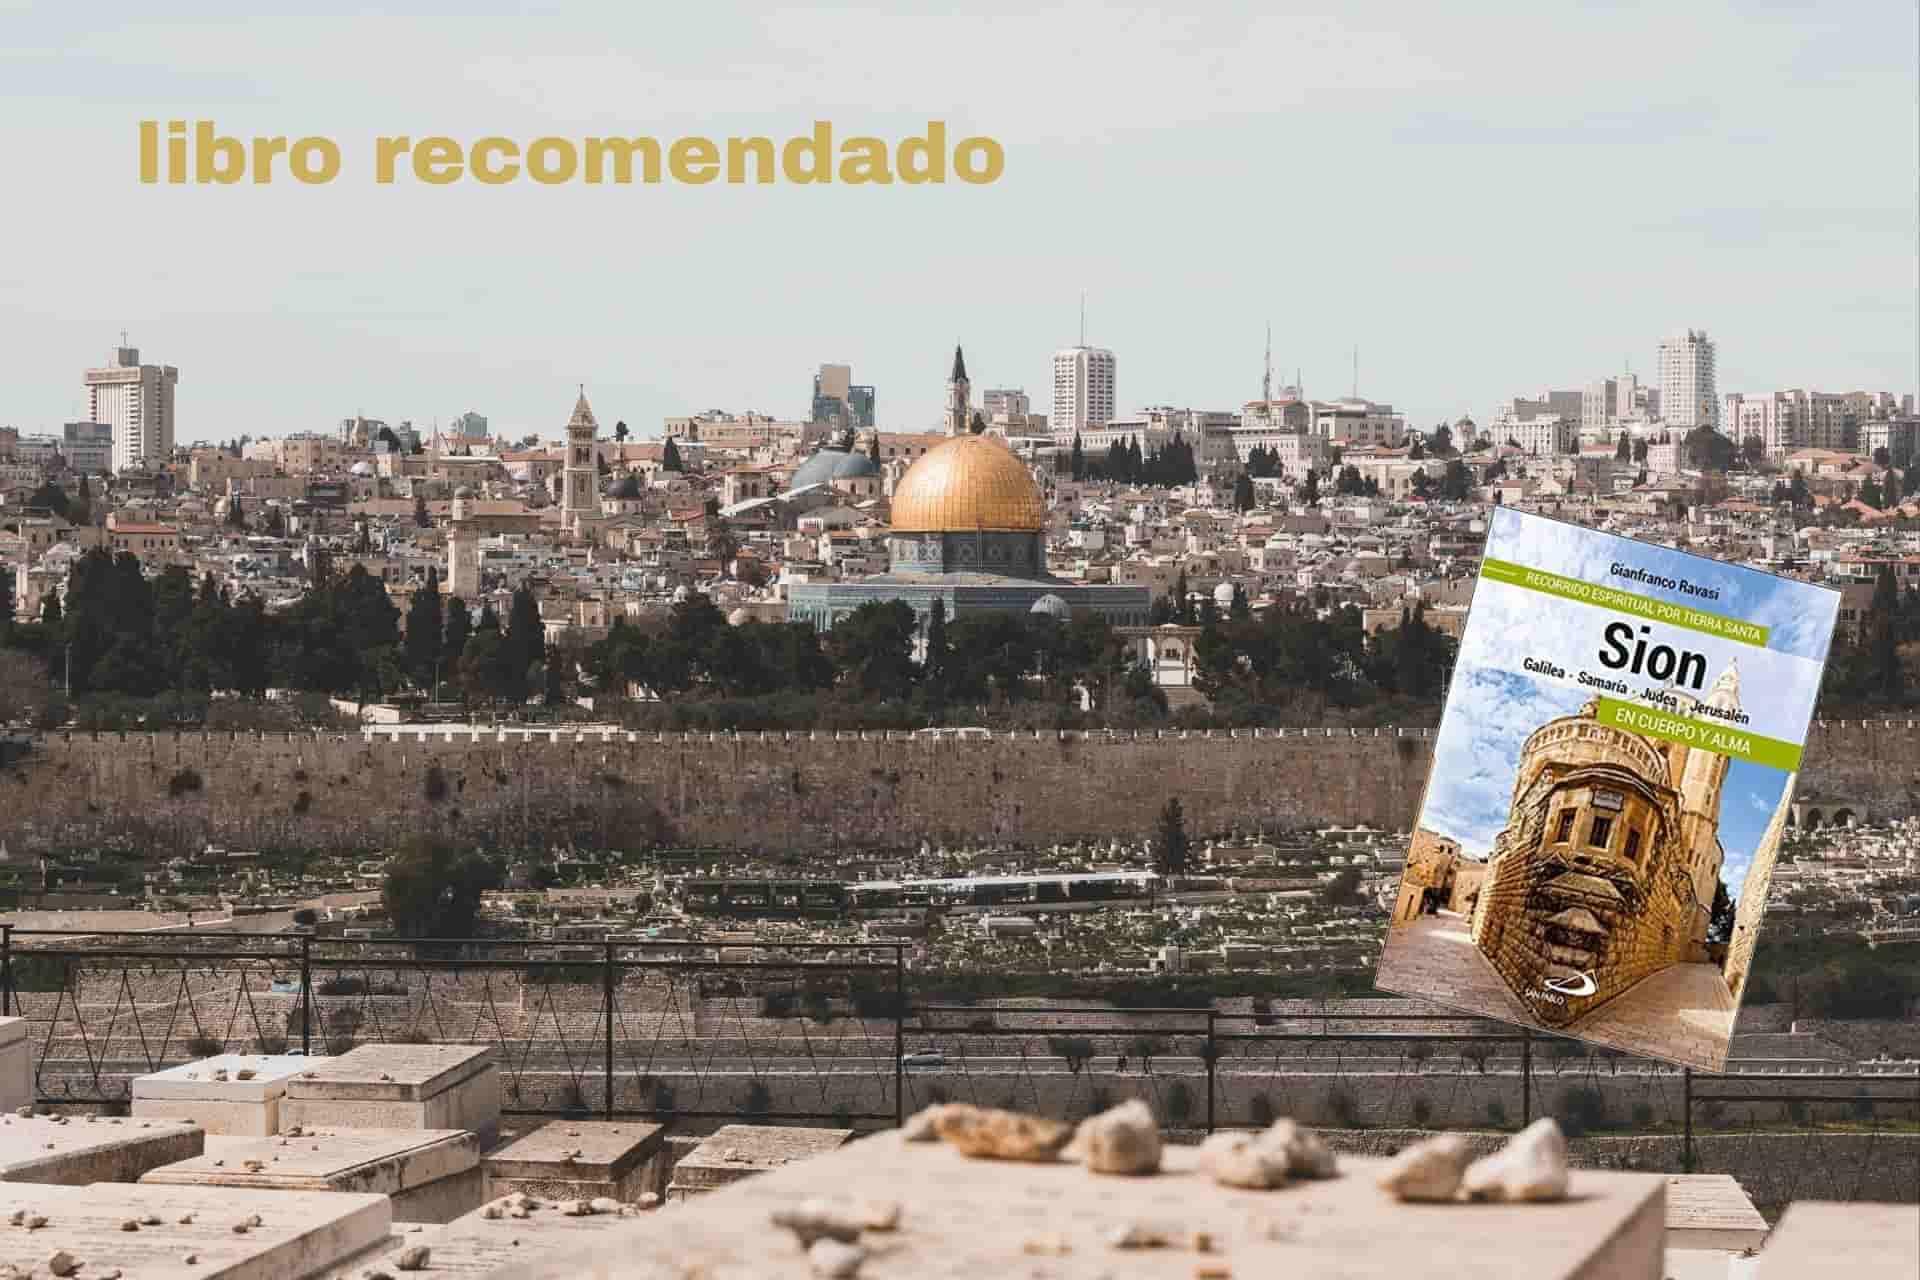 Cabecera Sion recorrido espiritual por Tierra Santa